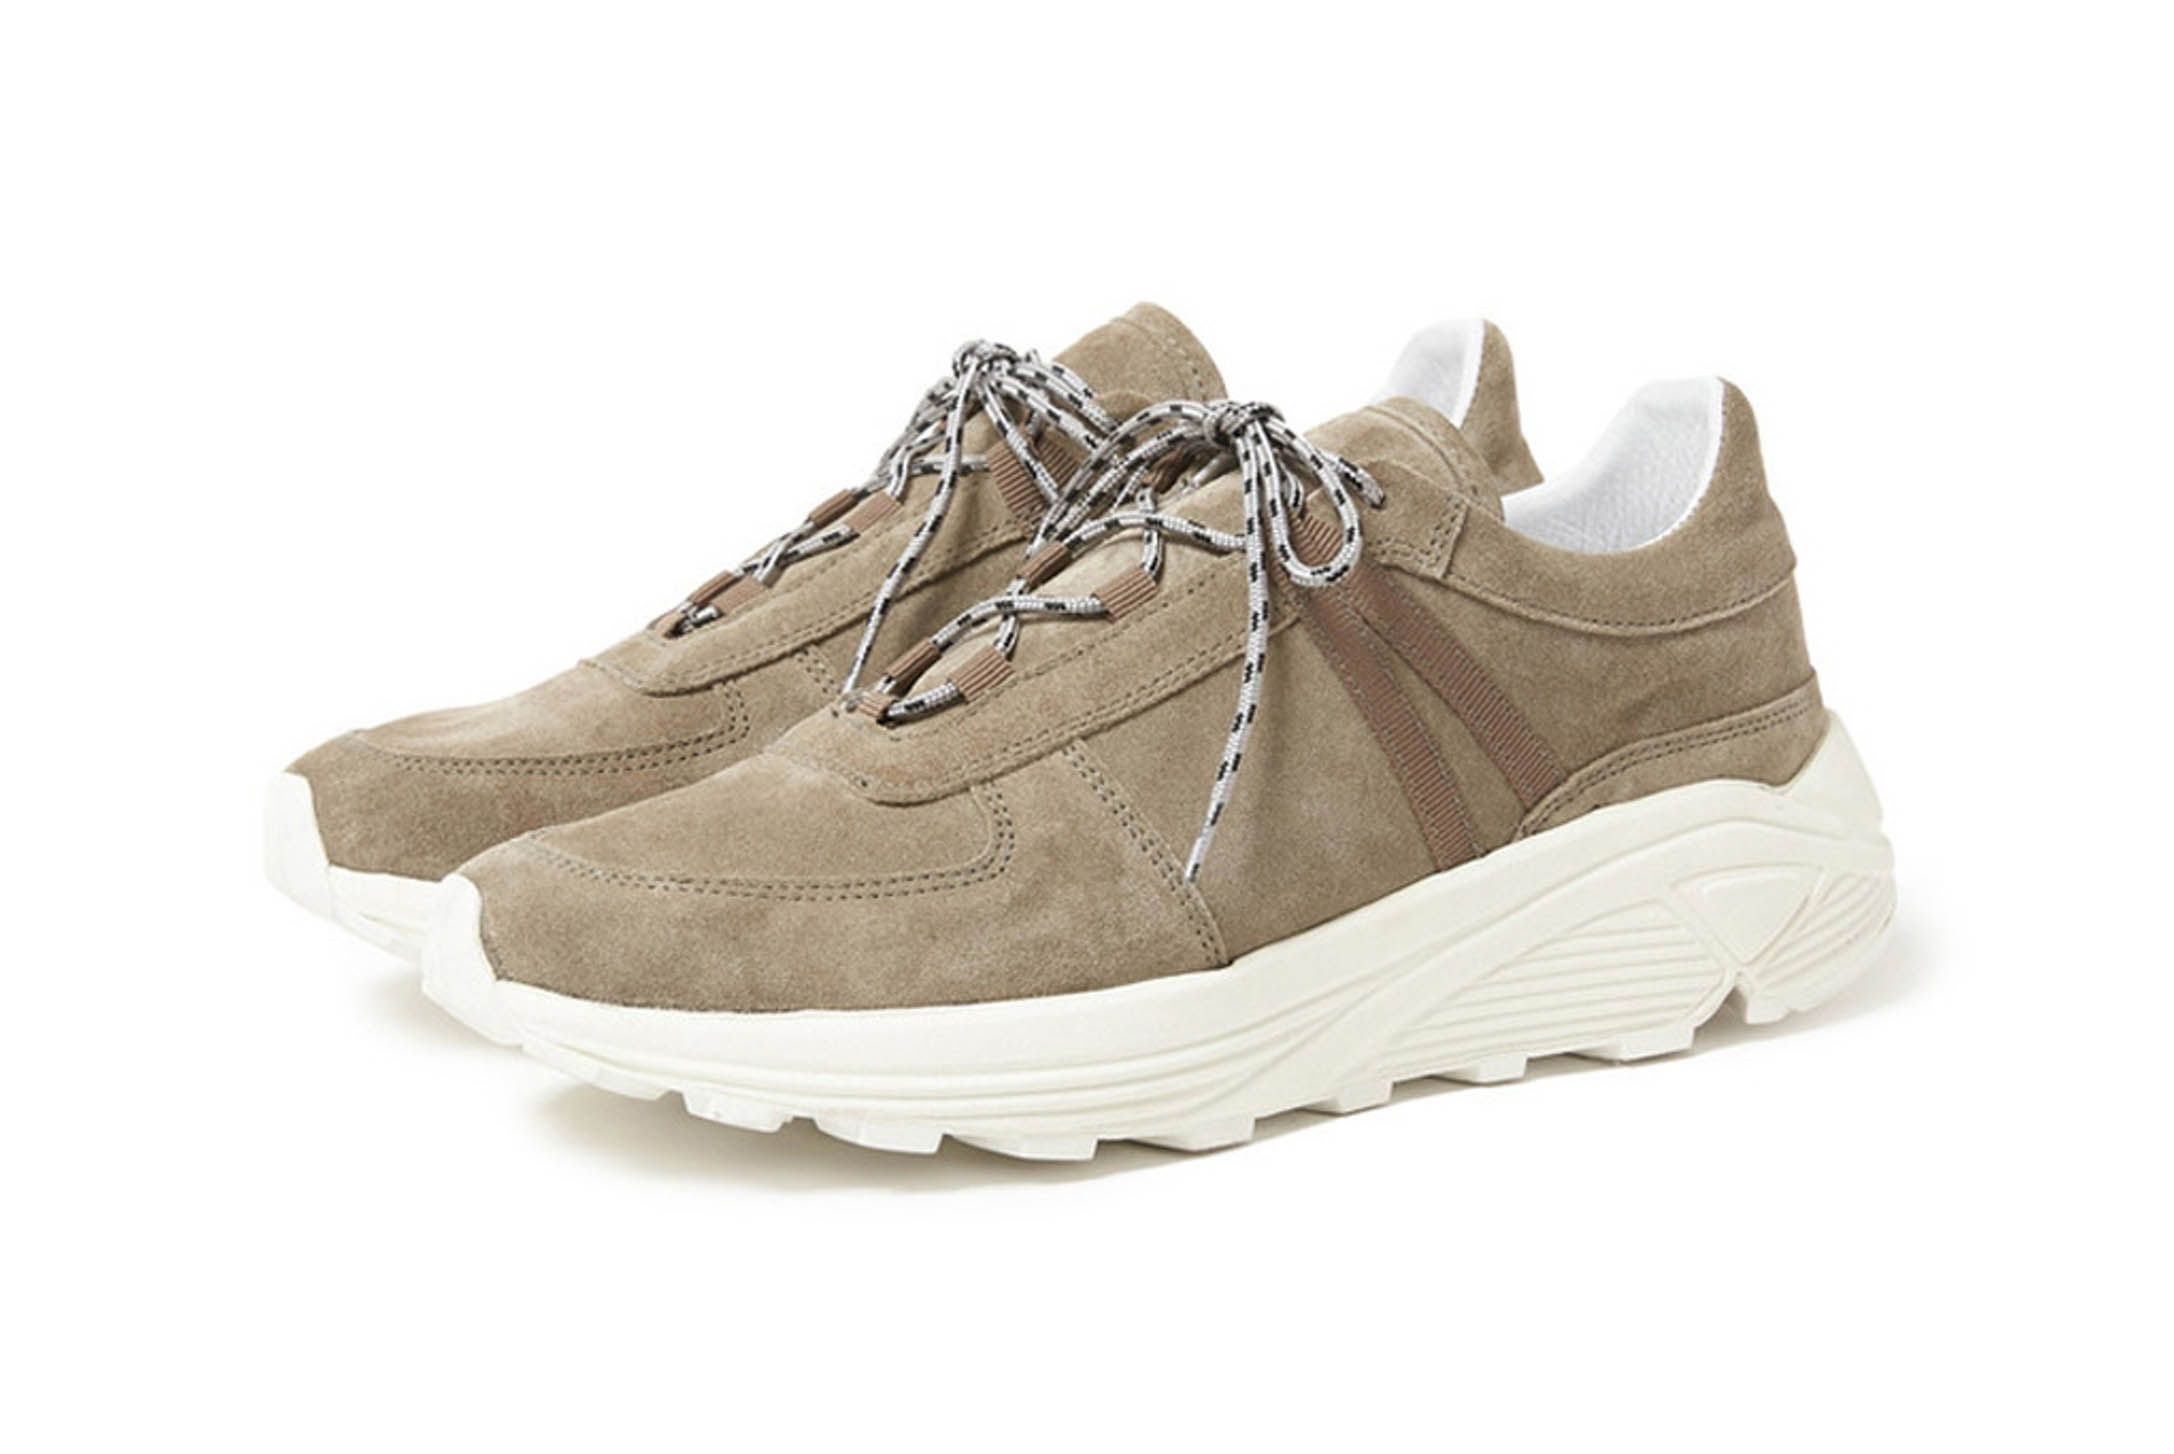 Nonnative Spring Summer 2018 Footwear Collection 3 Sneaker Freaker